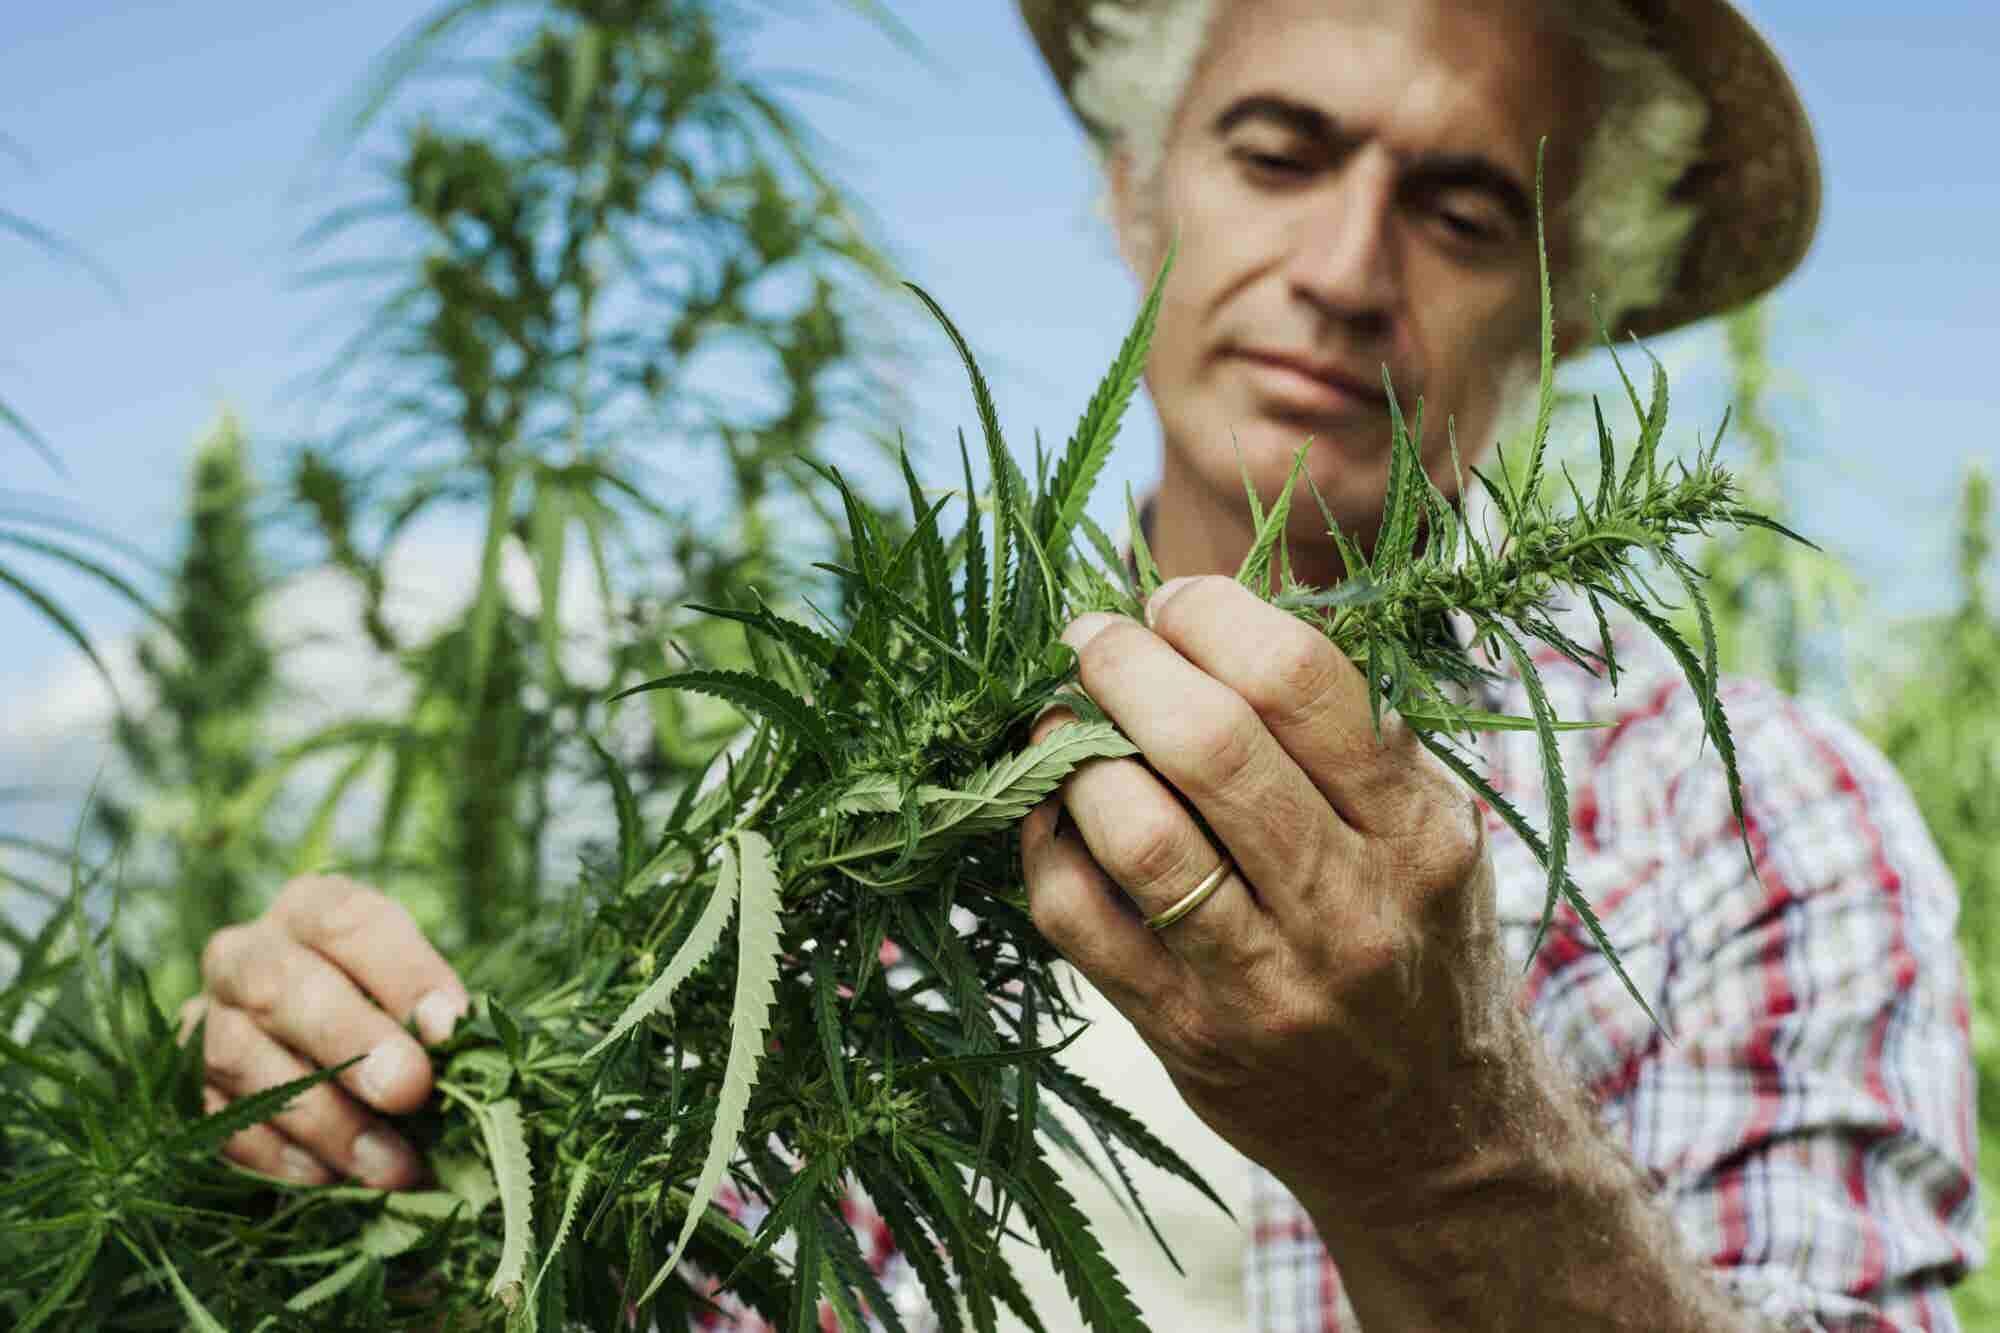 5 Essential Characterics of a Cannabis Entrepreneur